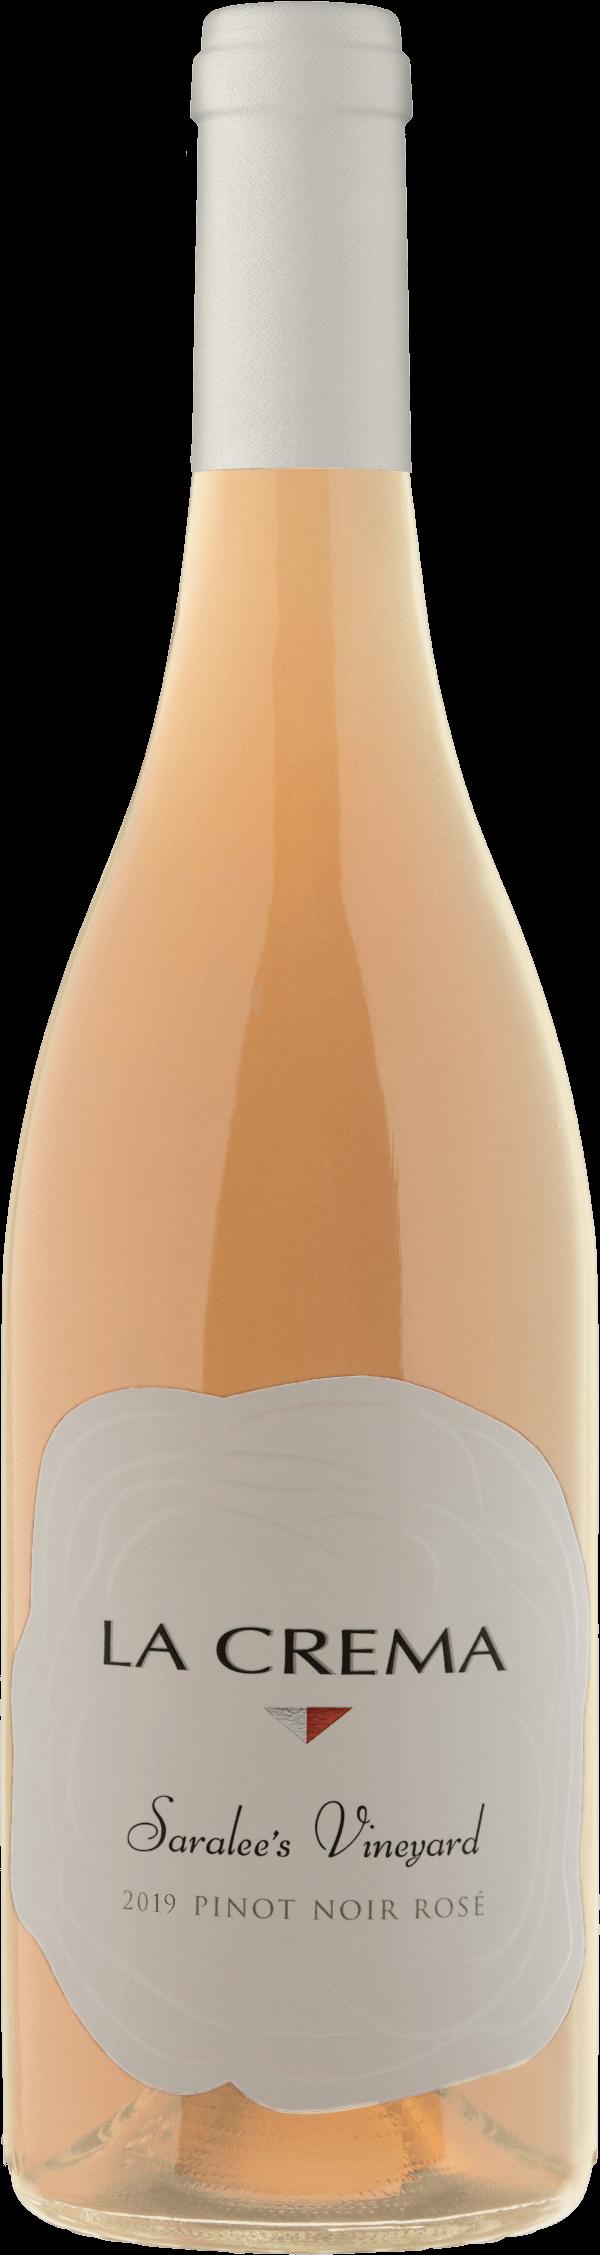 2019 Saralee's Vineyard Pinot Noir Rosé